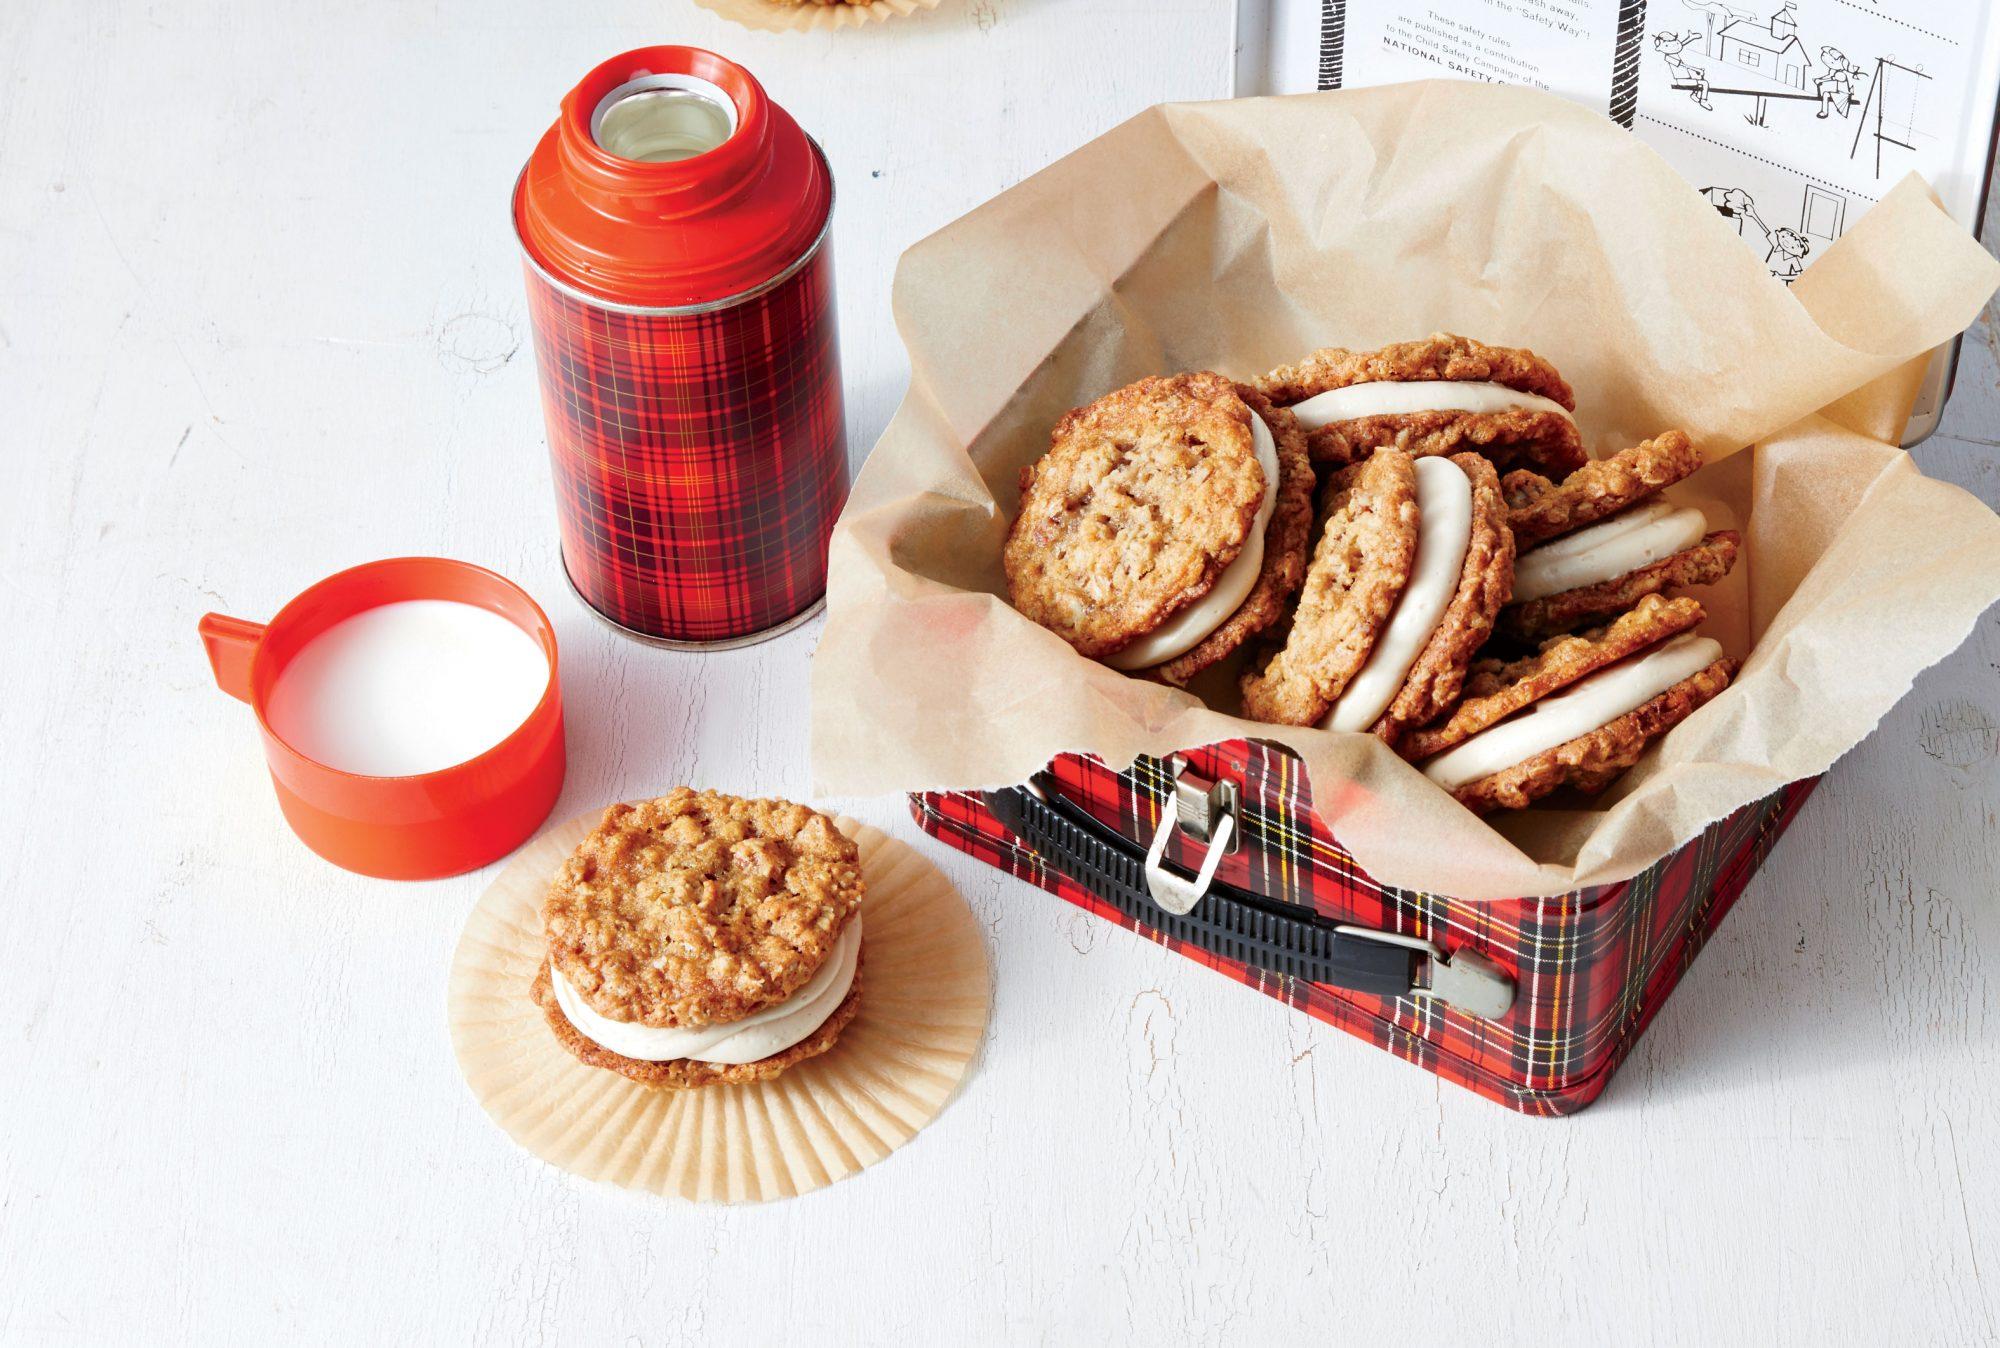 Oatmeal-Caramel Cream Pies